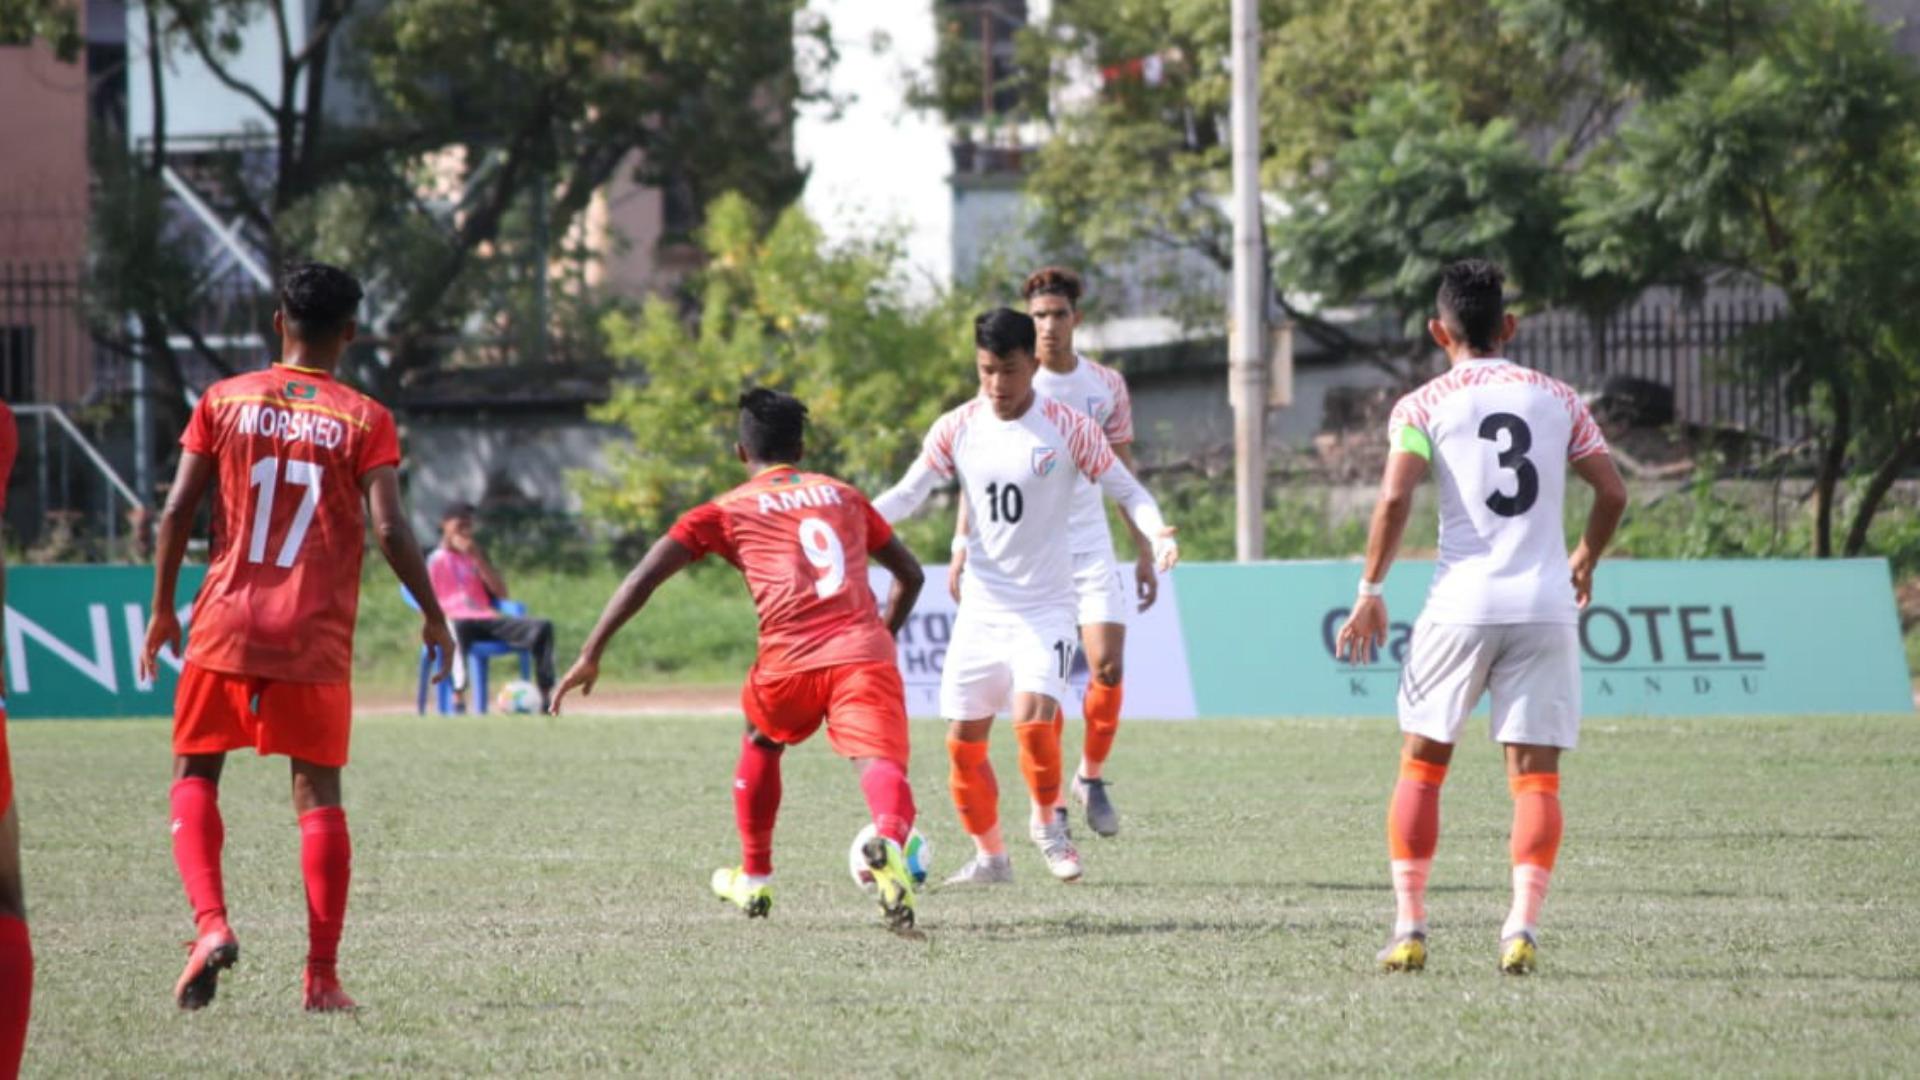 Givson Singh India U18 Bangladesh 2019 SAFF U18 Championship